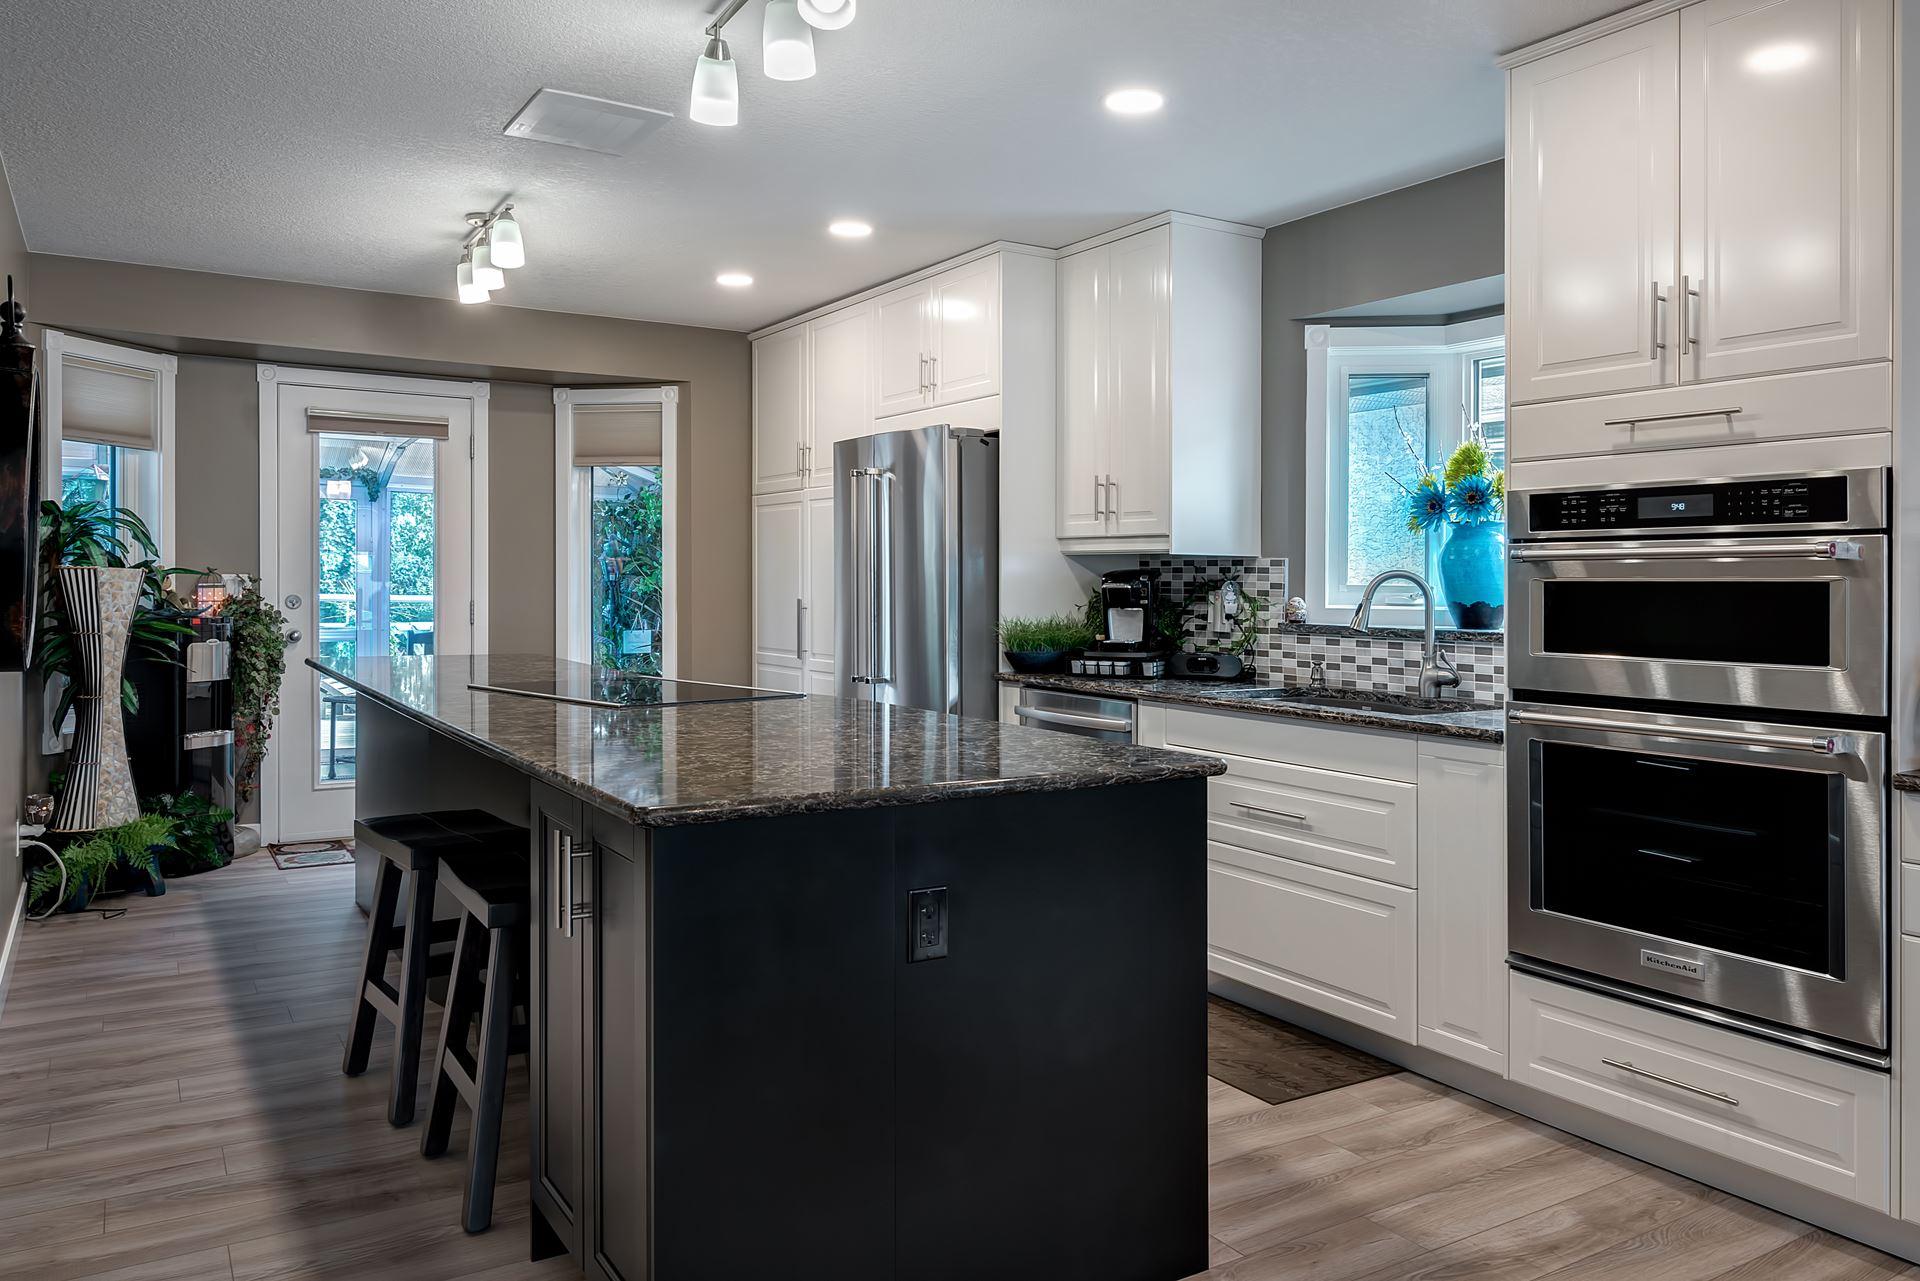 Jordan Crescent Major Renovation | Alair Homes Edmonton